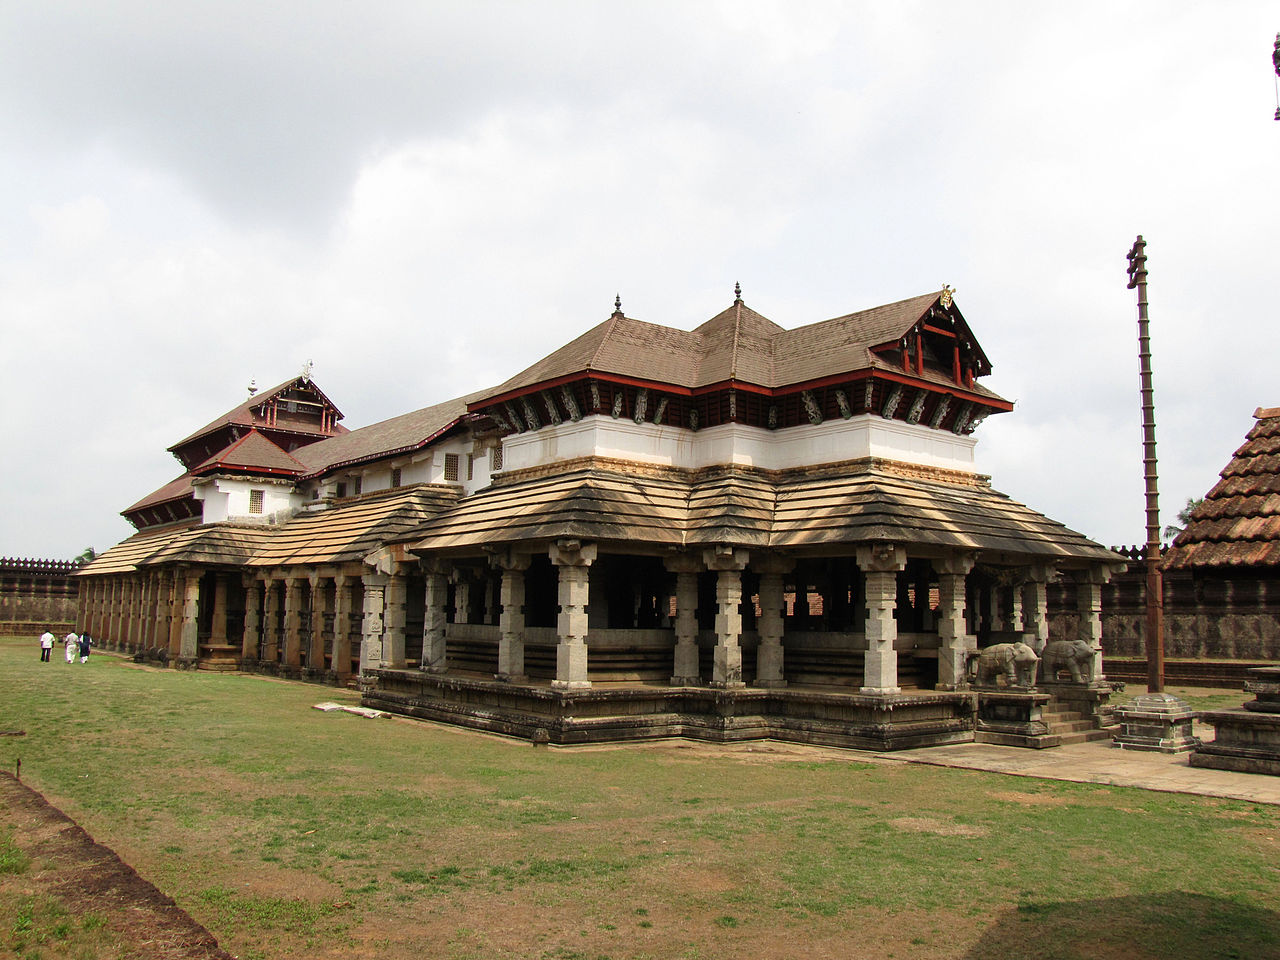 Amazing Place To See Near The Koppal Fort-Jaina Kashi, Kinhal